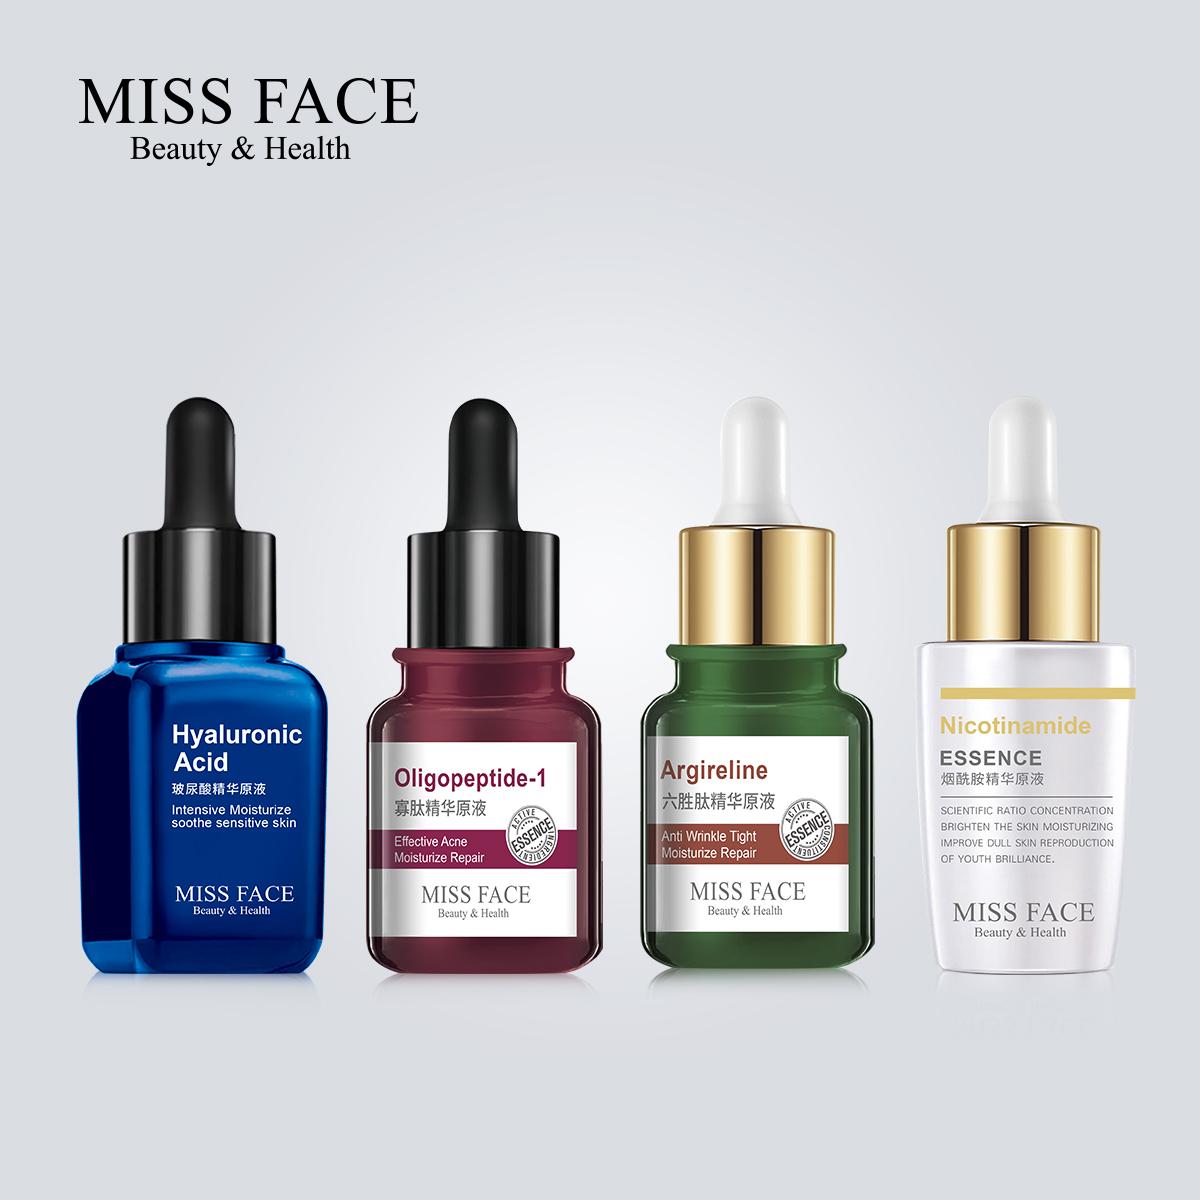 Miss face面部精华原液组合装补水保湿去痘印提拉紧致淡化细纹